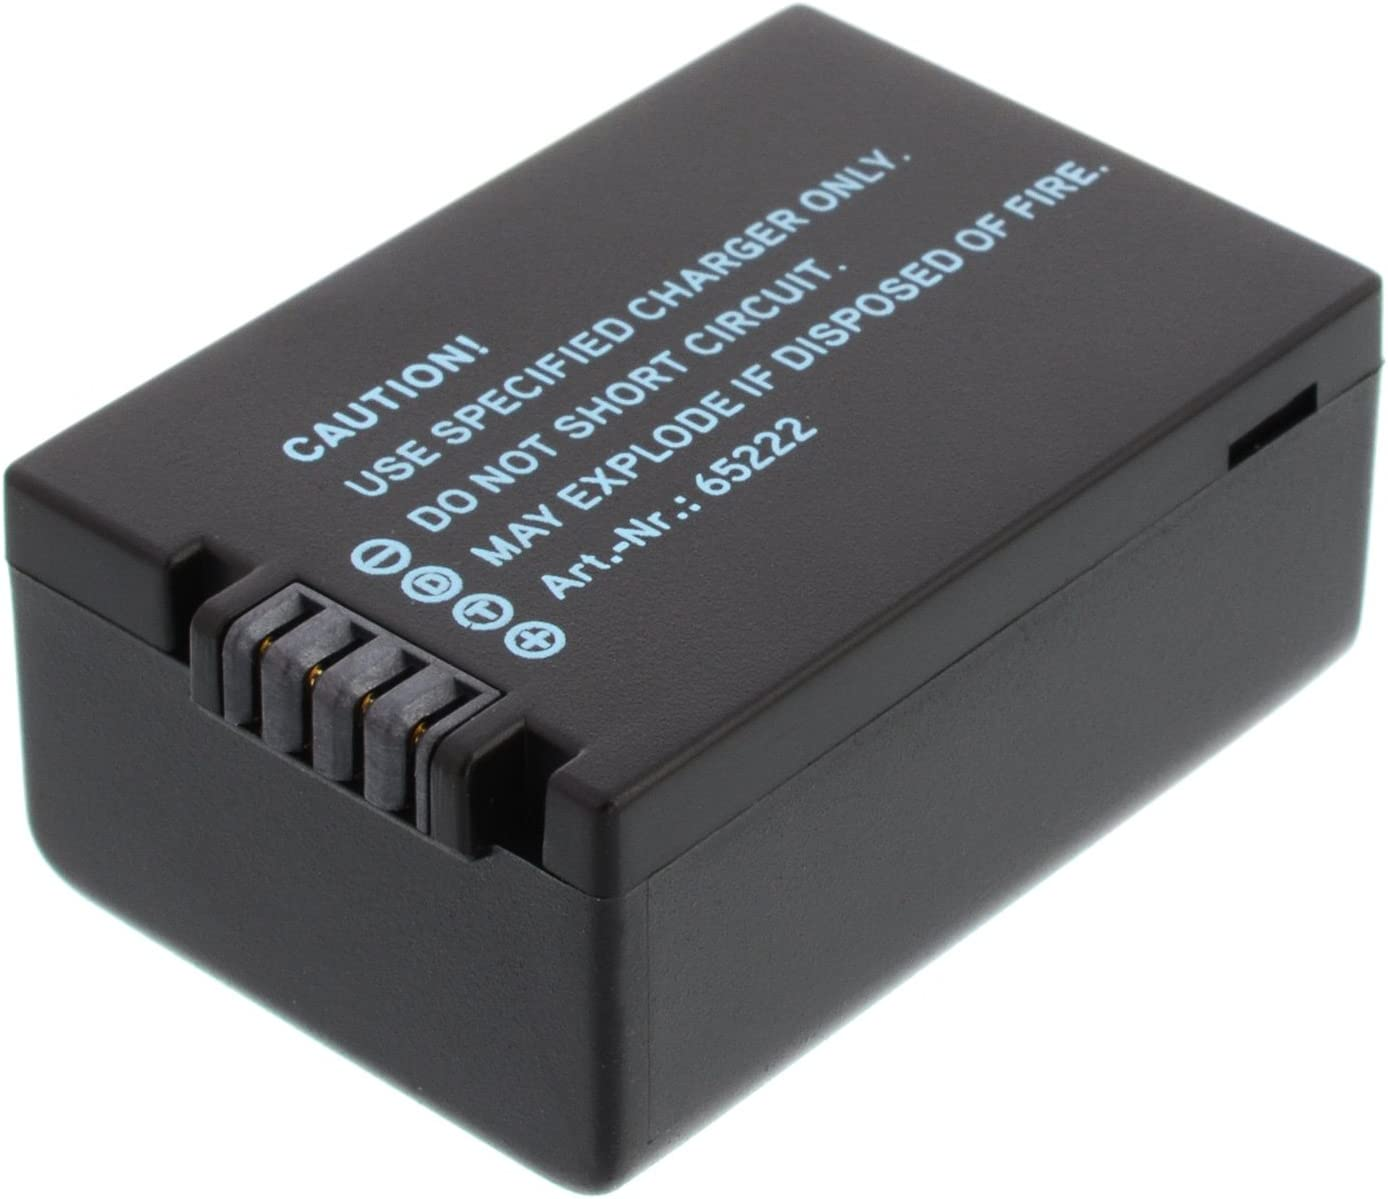 blumax Bater/ía Panasonic DMW-BMB9 DMW-BMB9E 890mAh Adaptado para Panasonic Lumix DMC-FZ40-FZ45-FZ47-FZ48-FZ60-FZ62-FZ70-FZ72-FZ100-FZ150 Leica V-Lux 2//3